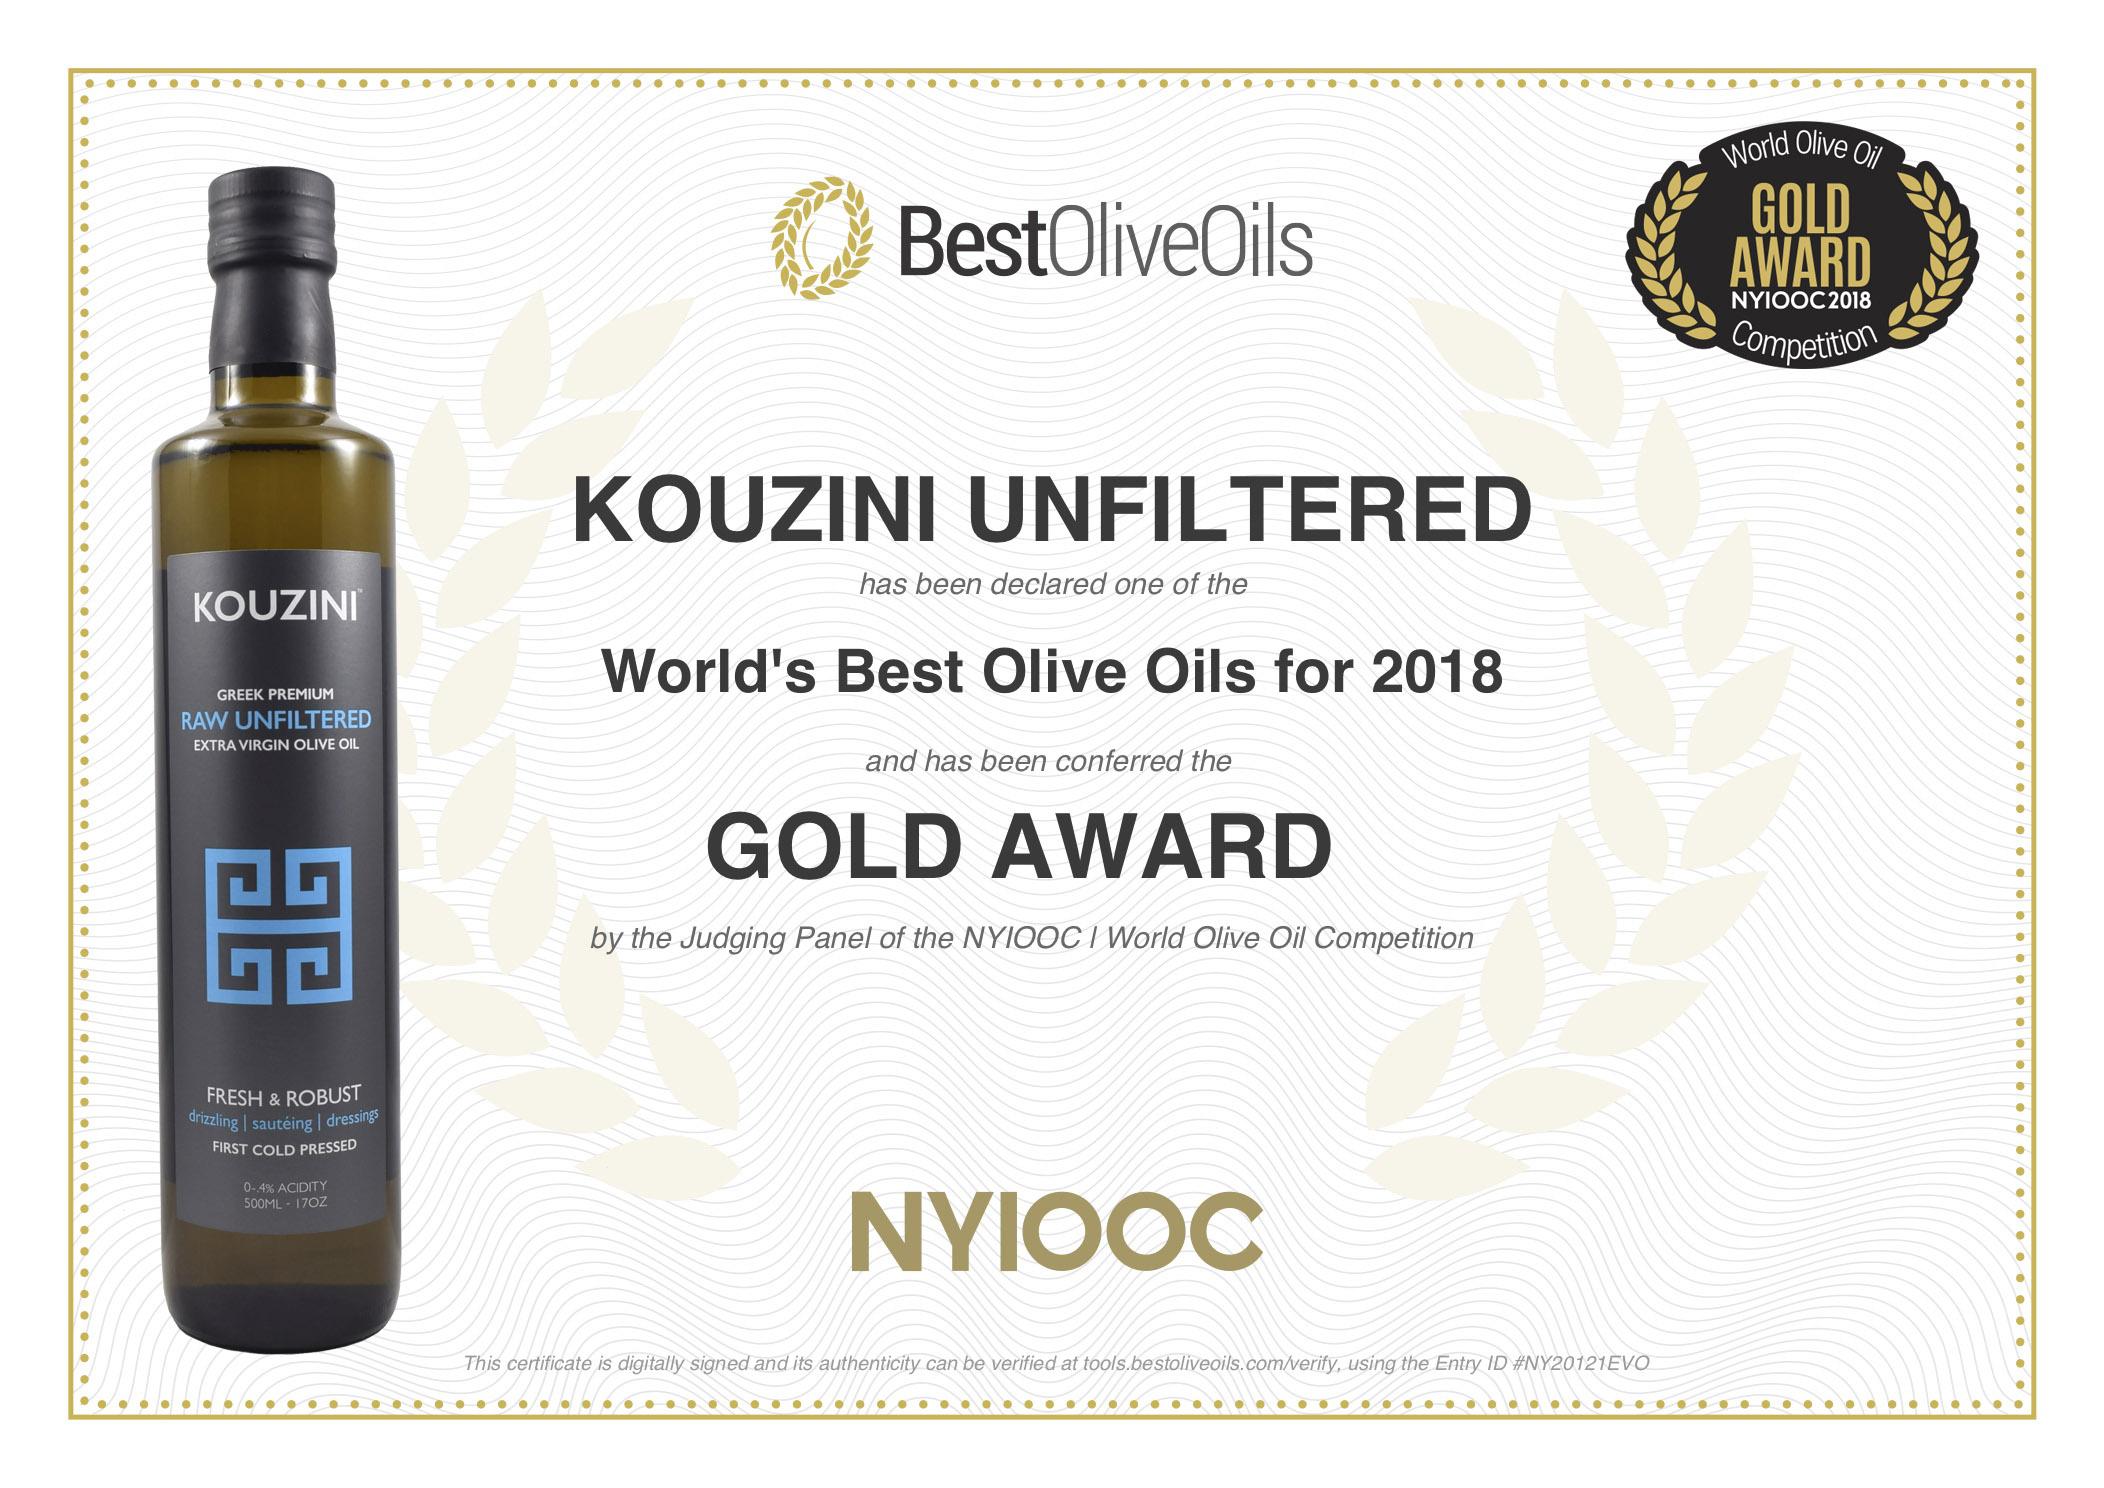 Kouzini 2018 Gold Award 2.jpg